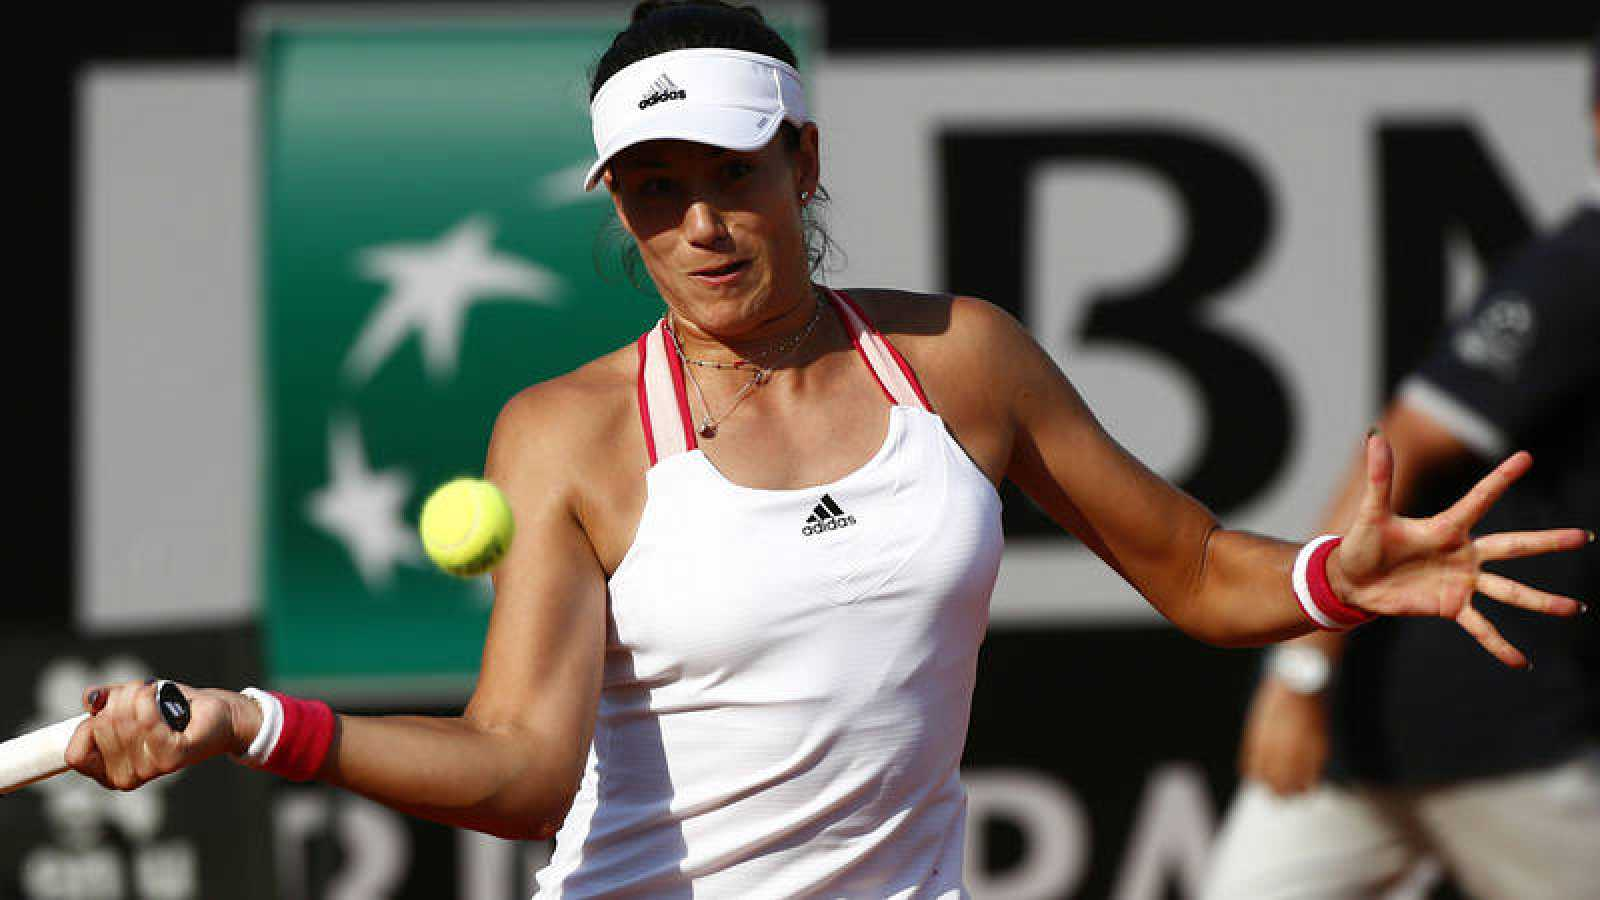 La tenista española Garbiñe Muguruza, en acción frente a Johanna Kona.